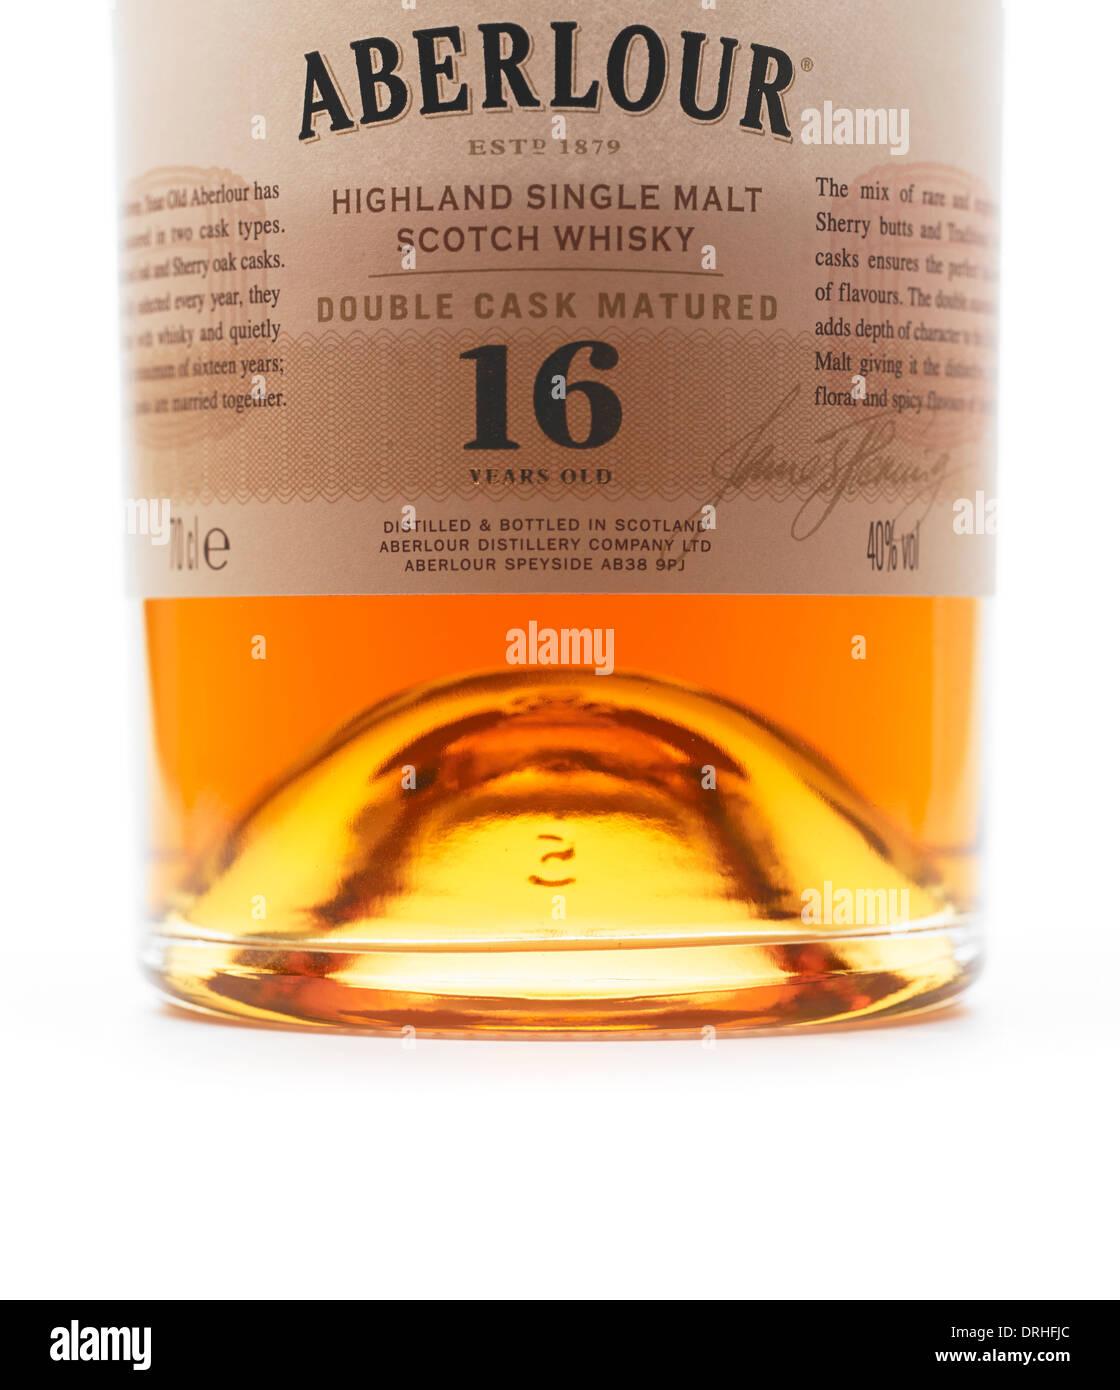 Aberlour 16 years old Scotch Whisky bottle - Stock Image